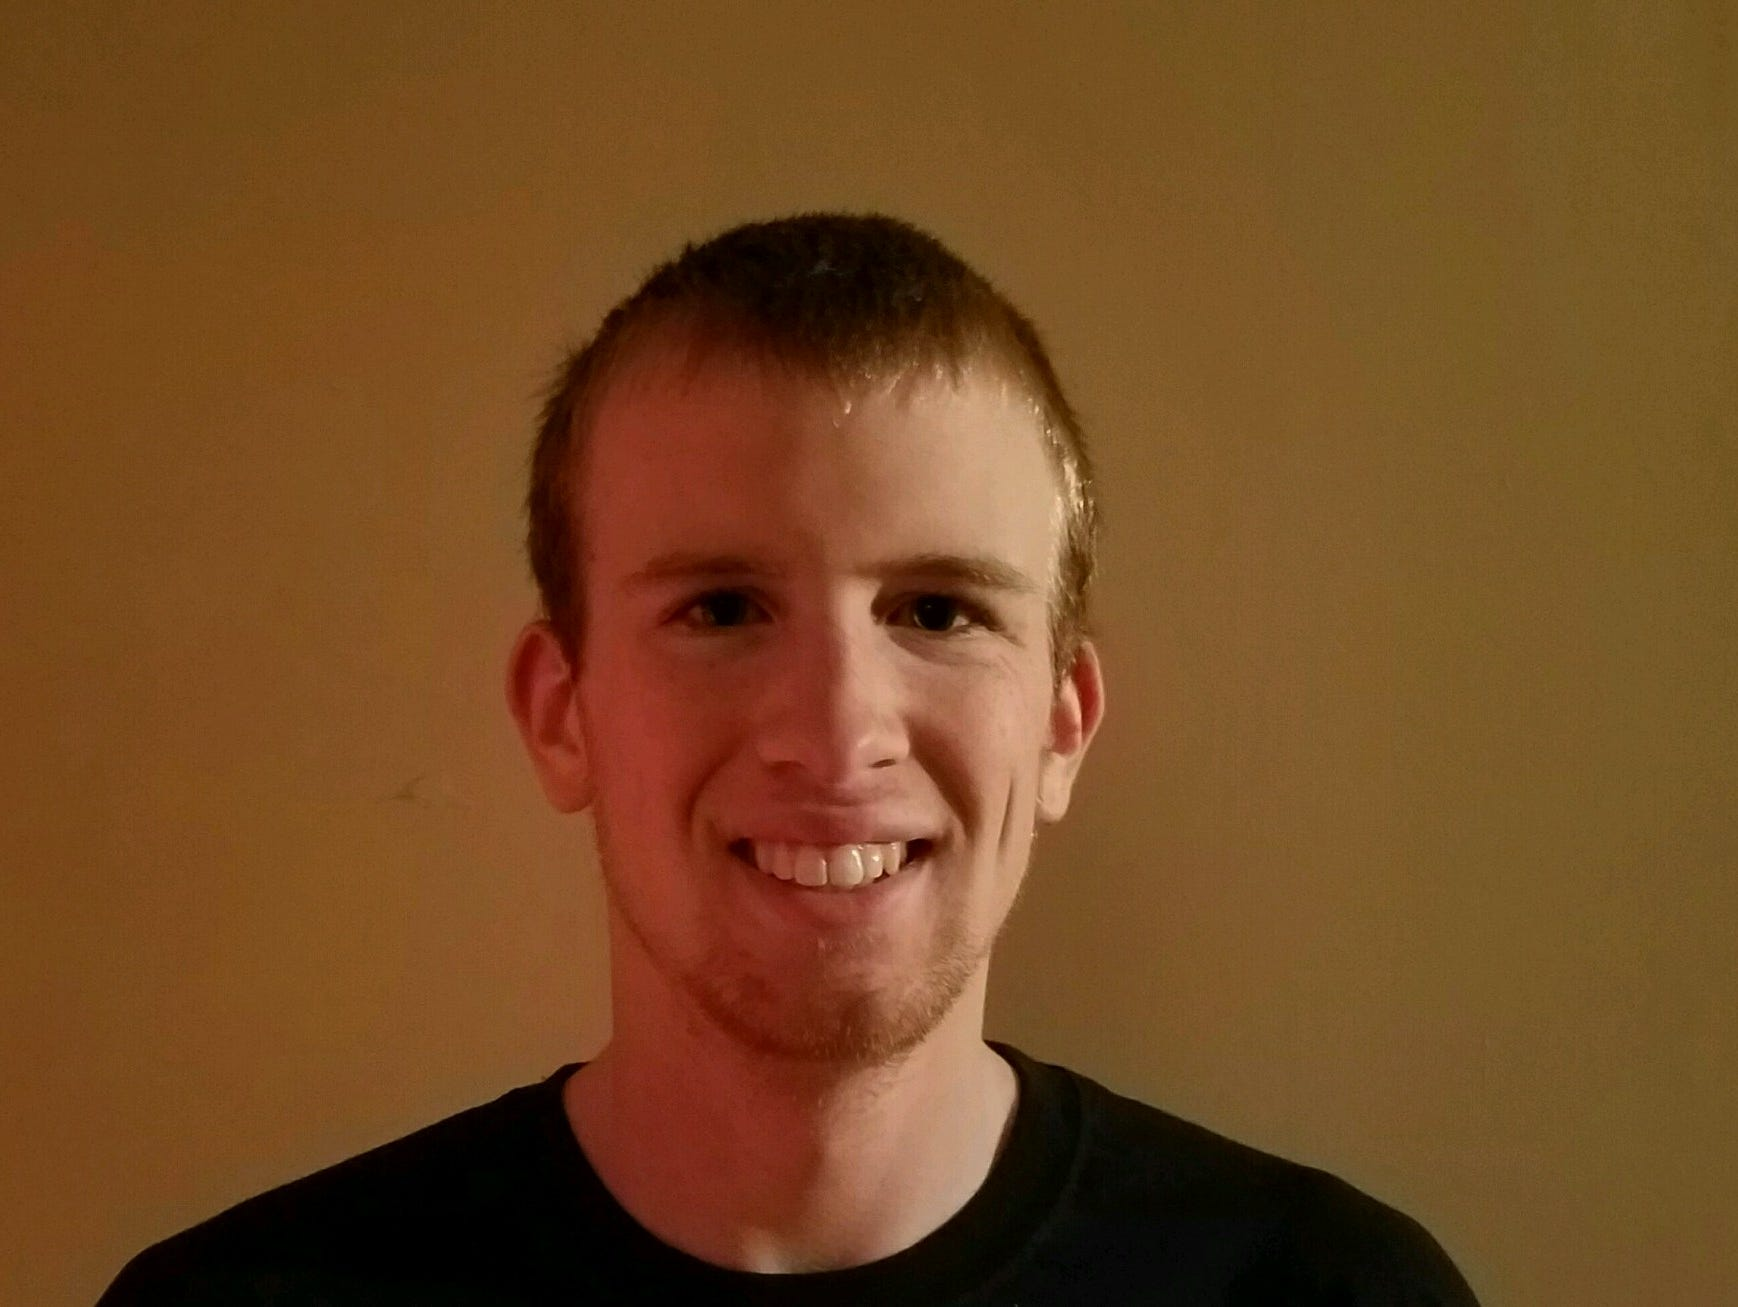 Arlington cross country runner Brendan Foley